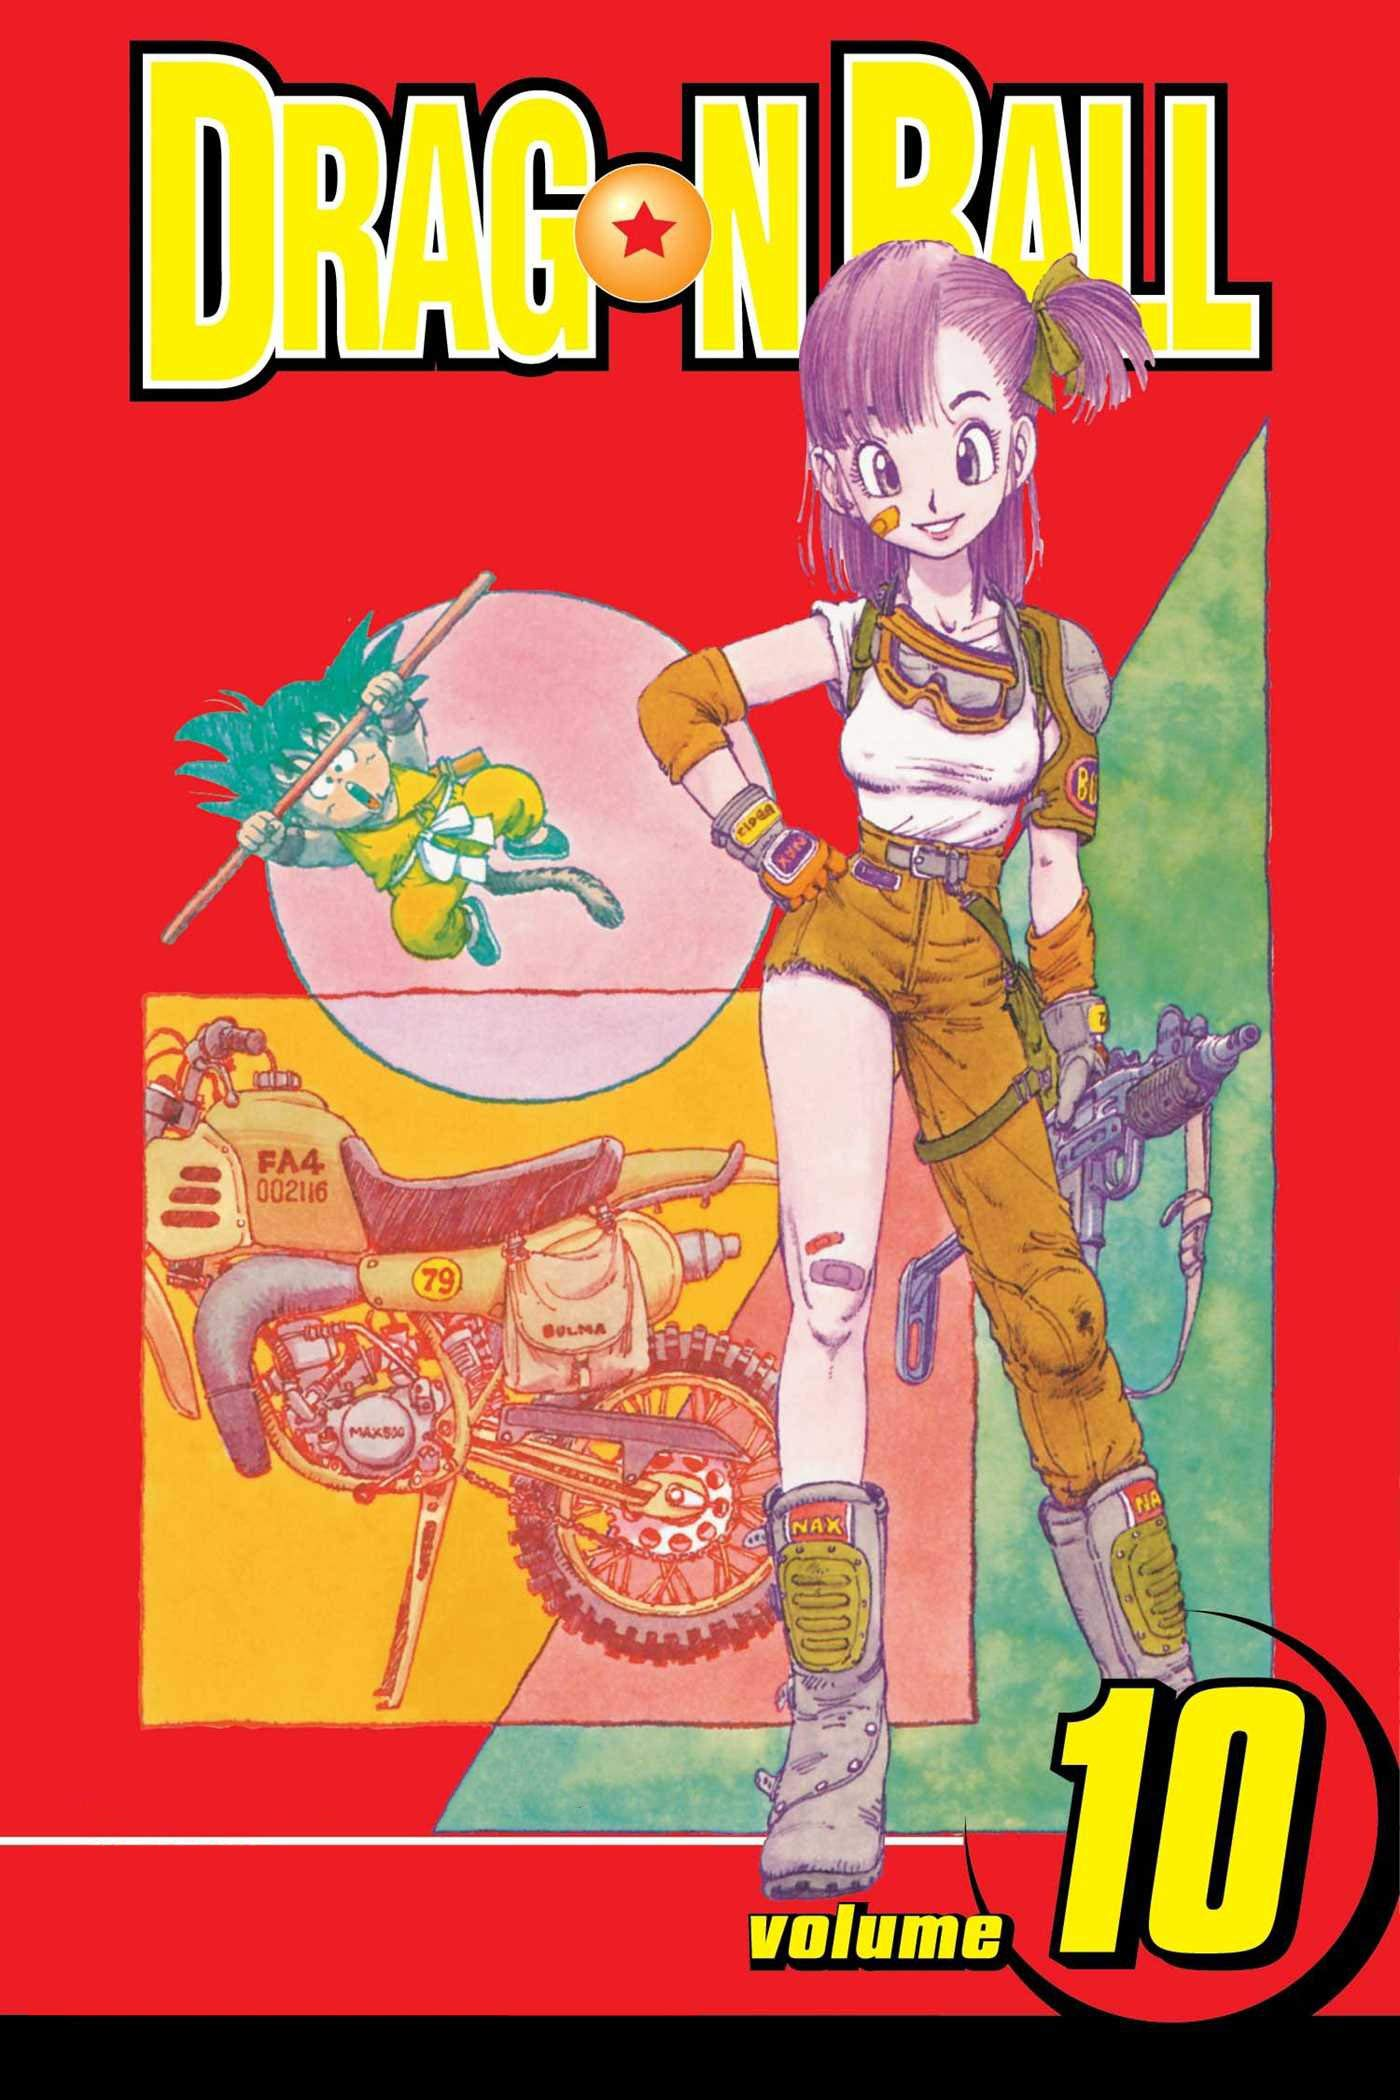 Dragon Ball: Manga volume 10